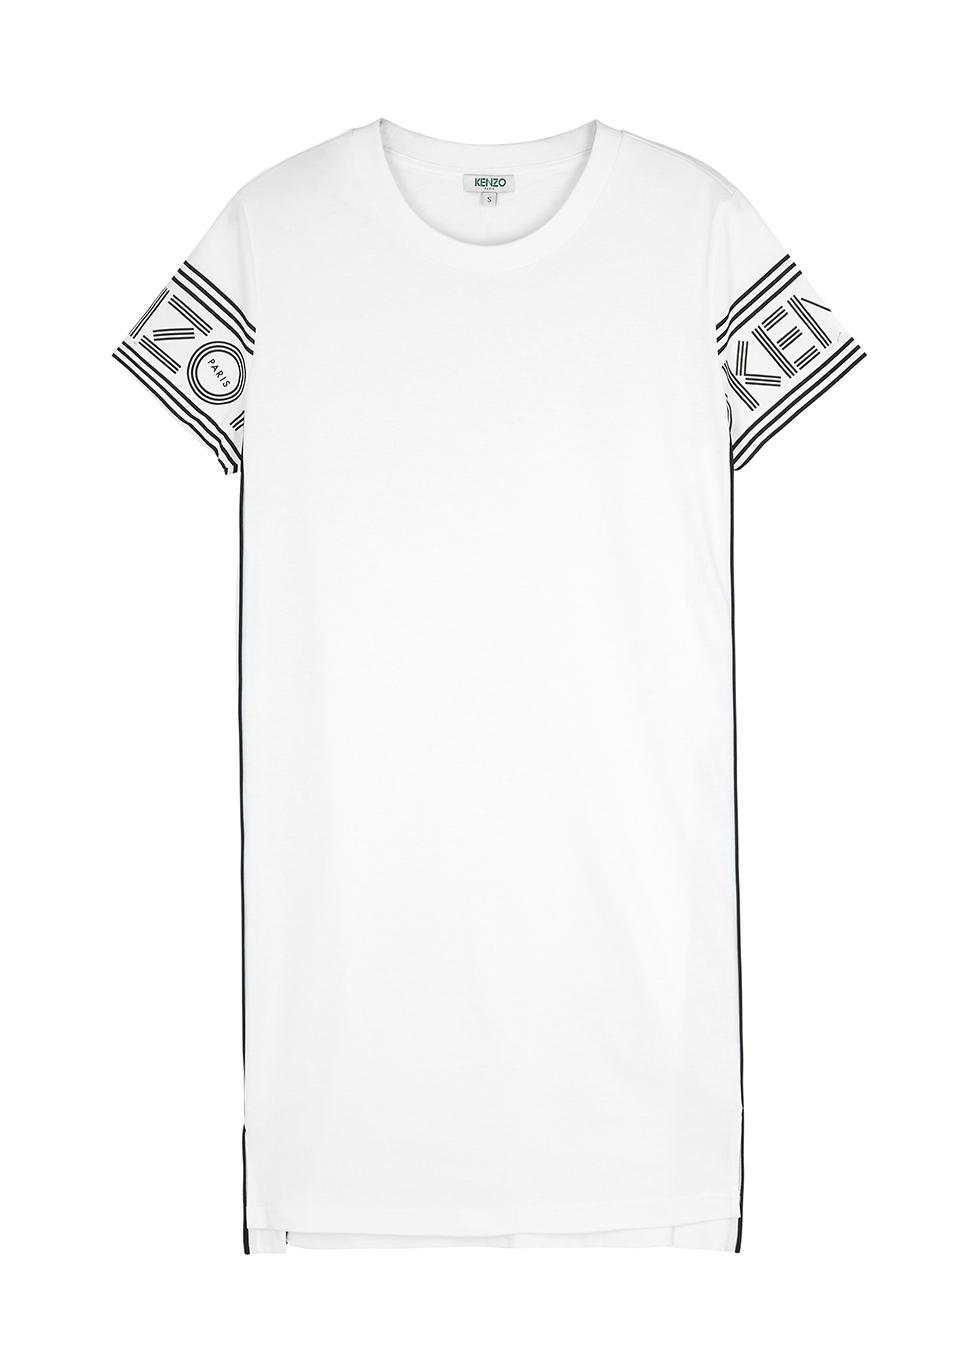 d667ed2a Kenzo - Designer Sweatshirts, T-Shirts, Bags - Harvey Nichols